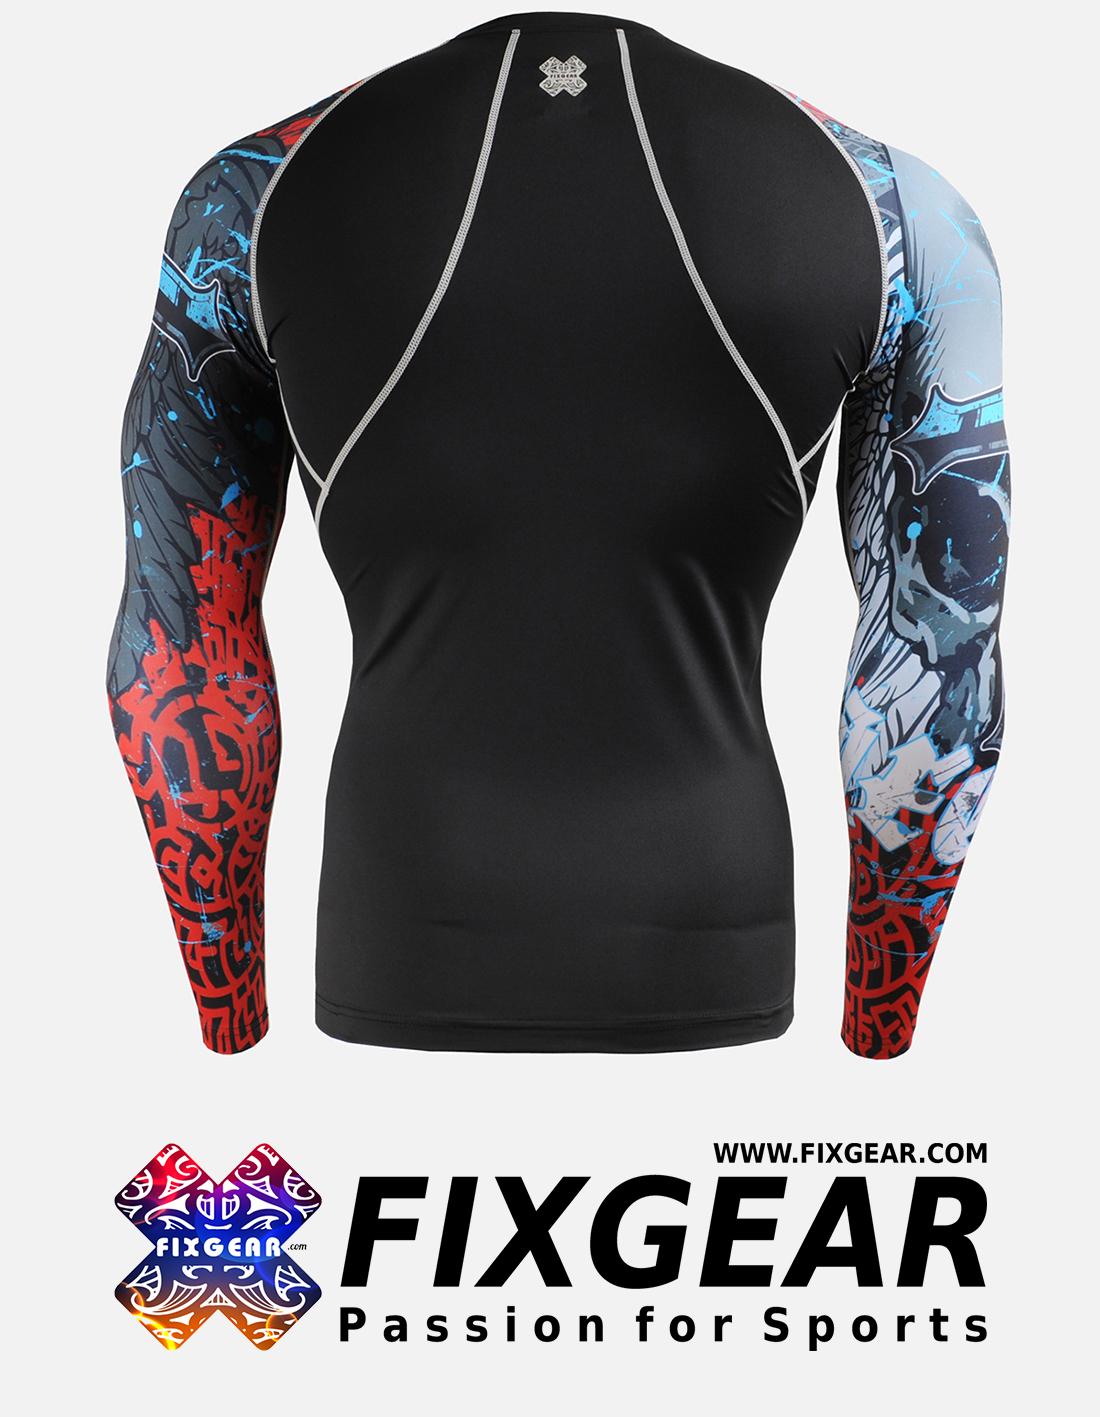 FIXGEAR CPD-B73 Compression Base Layer Shirt